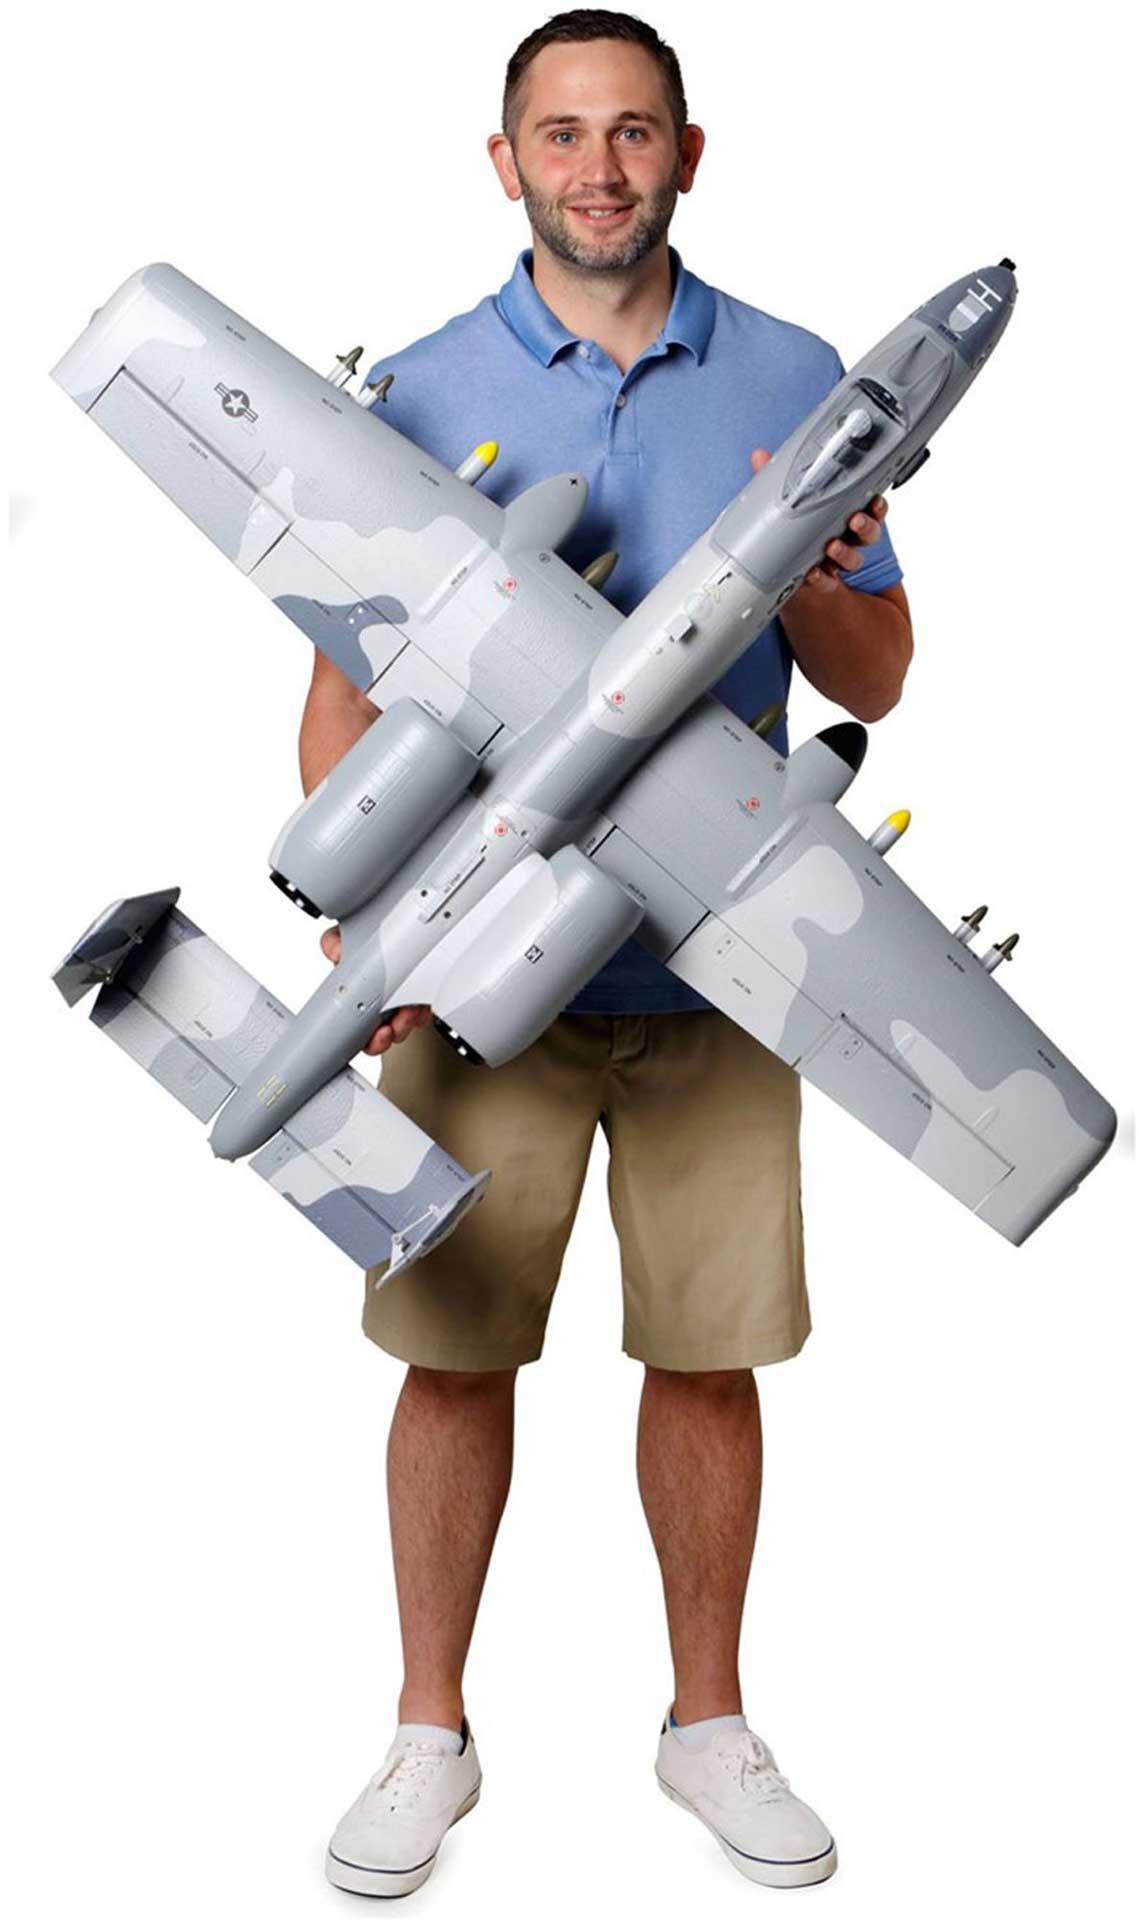 E-Flite A-10 THUNDERBOLT II 64MM EDF PNP